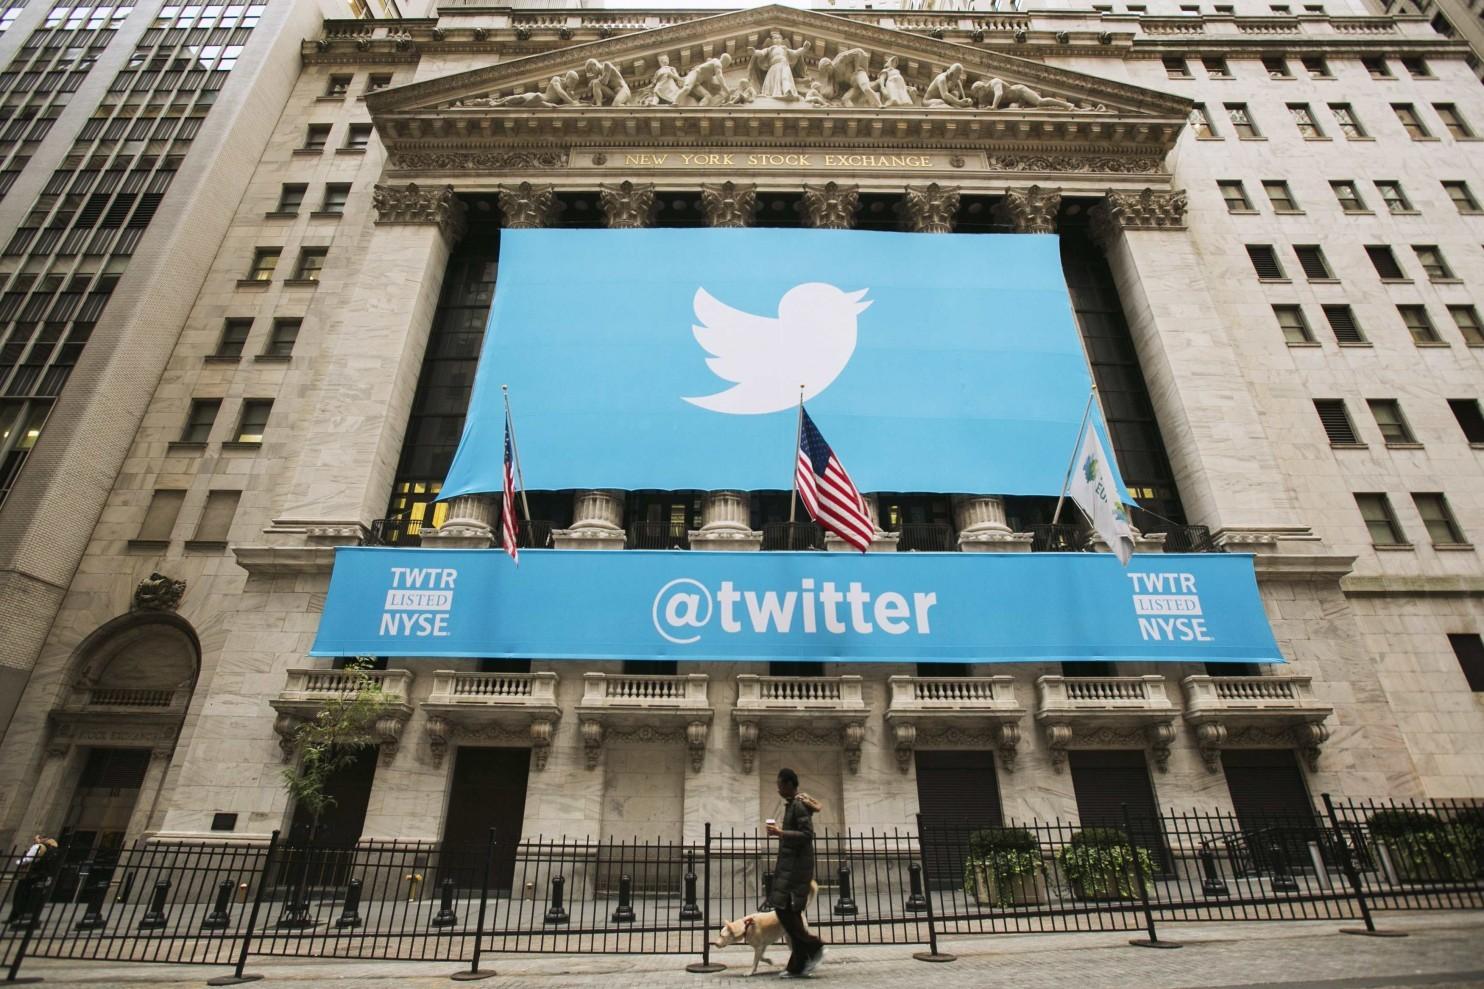 ФБР рекомендовало Twitter больше бороться с терроризмом